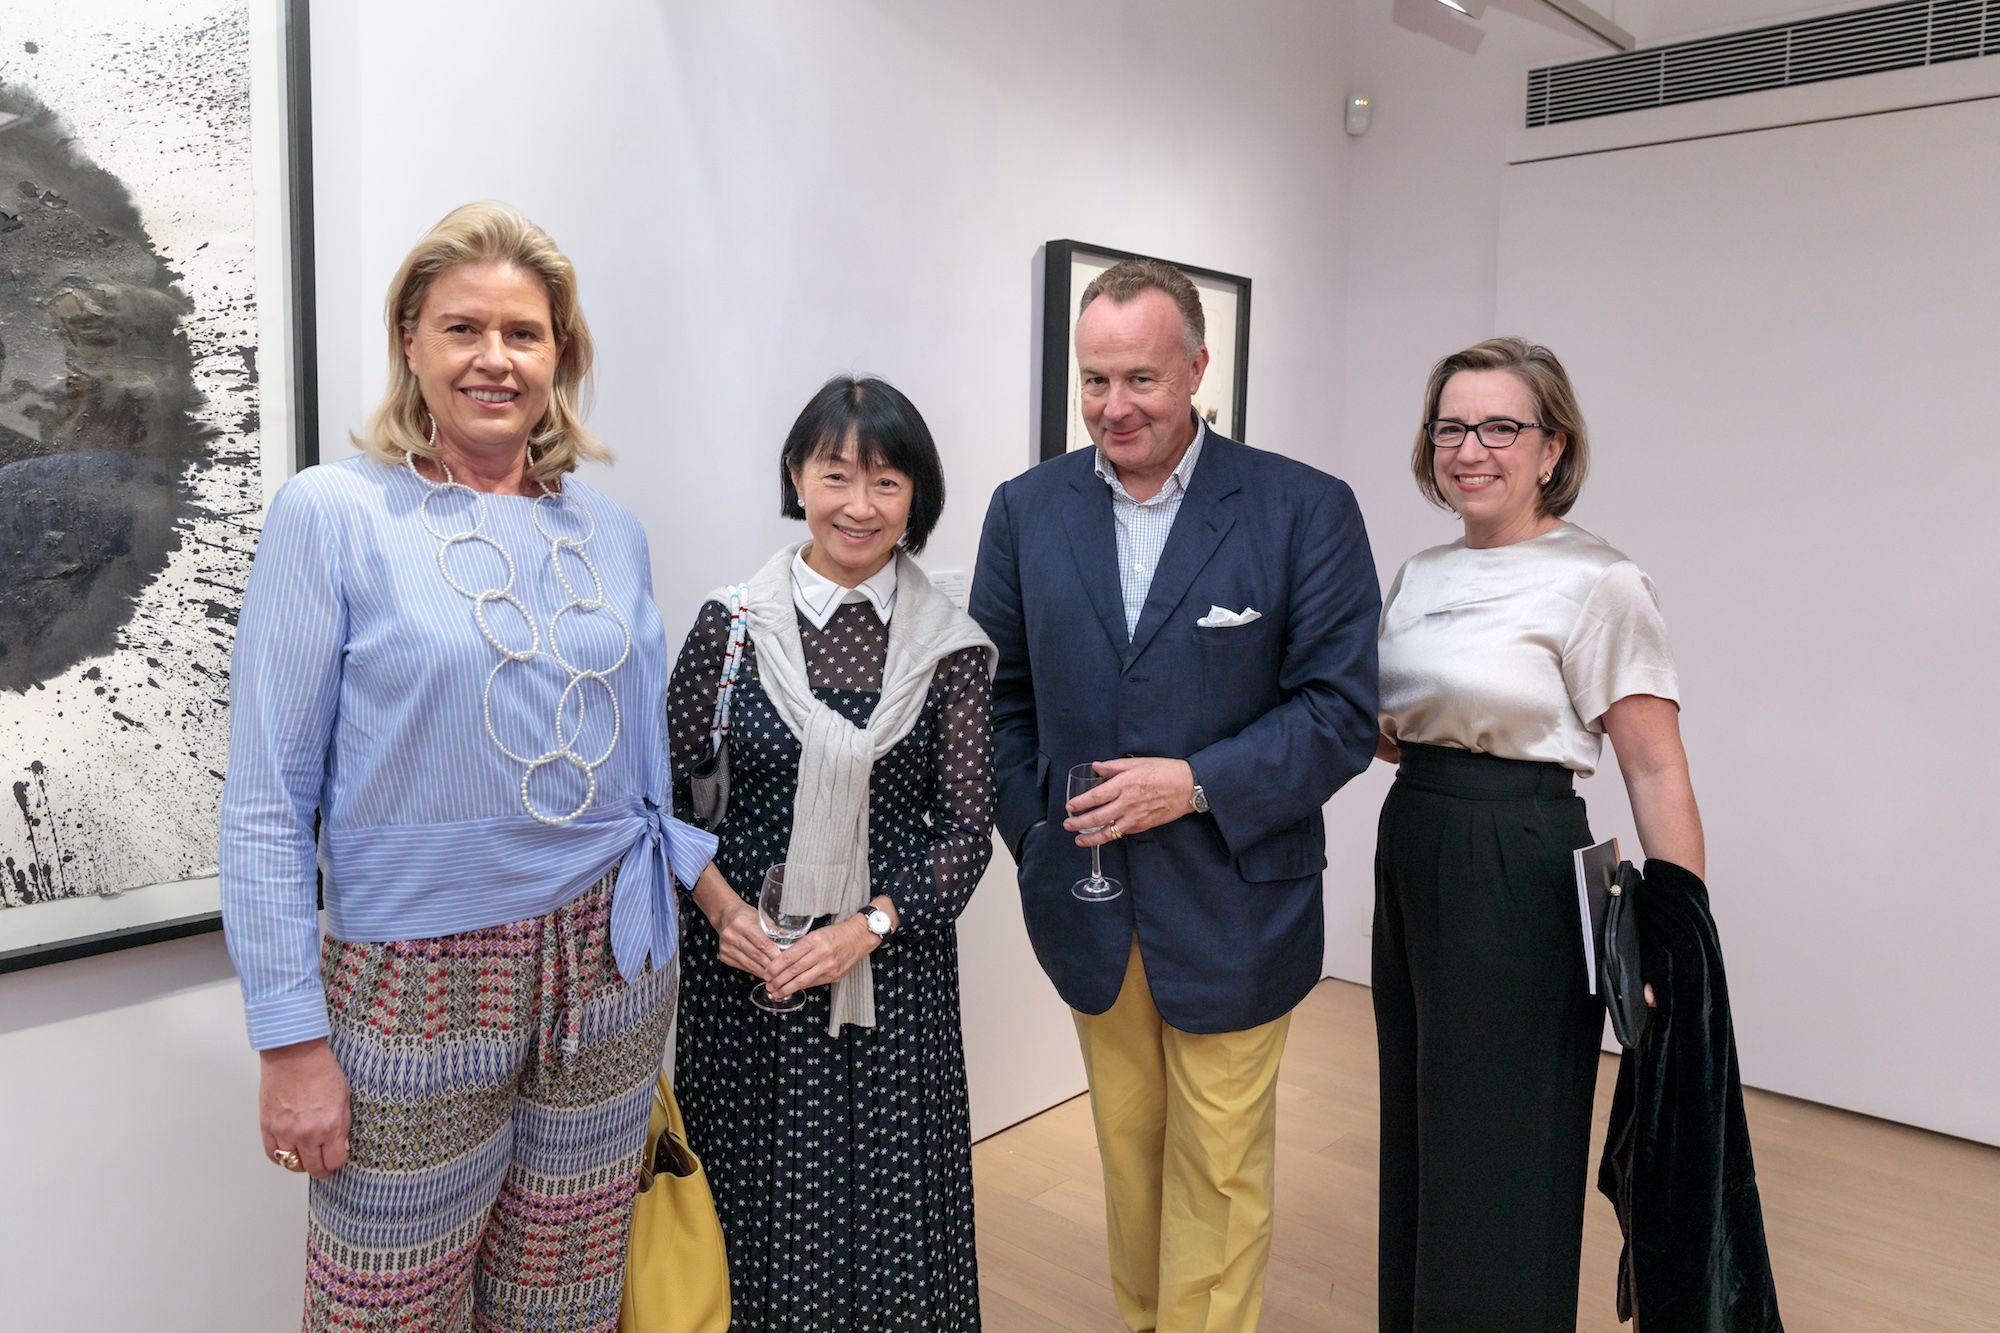 Désirée Jebsen, Nancy Lee, Hans Michael Jebsen, Anne Witt